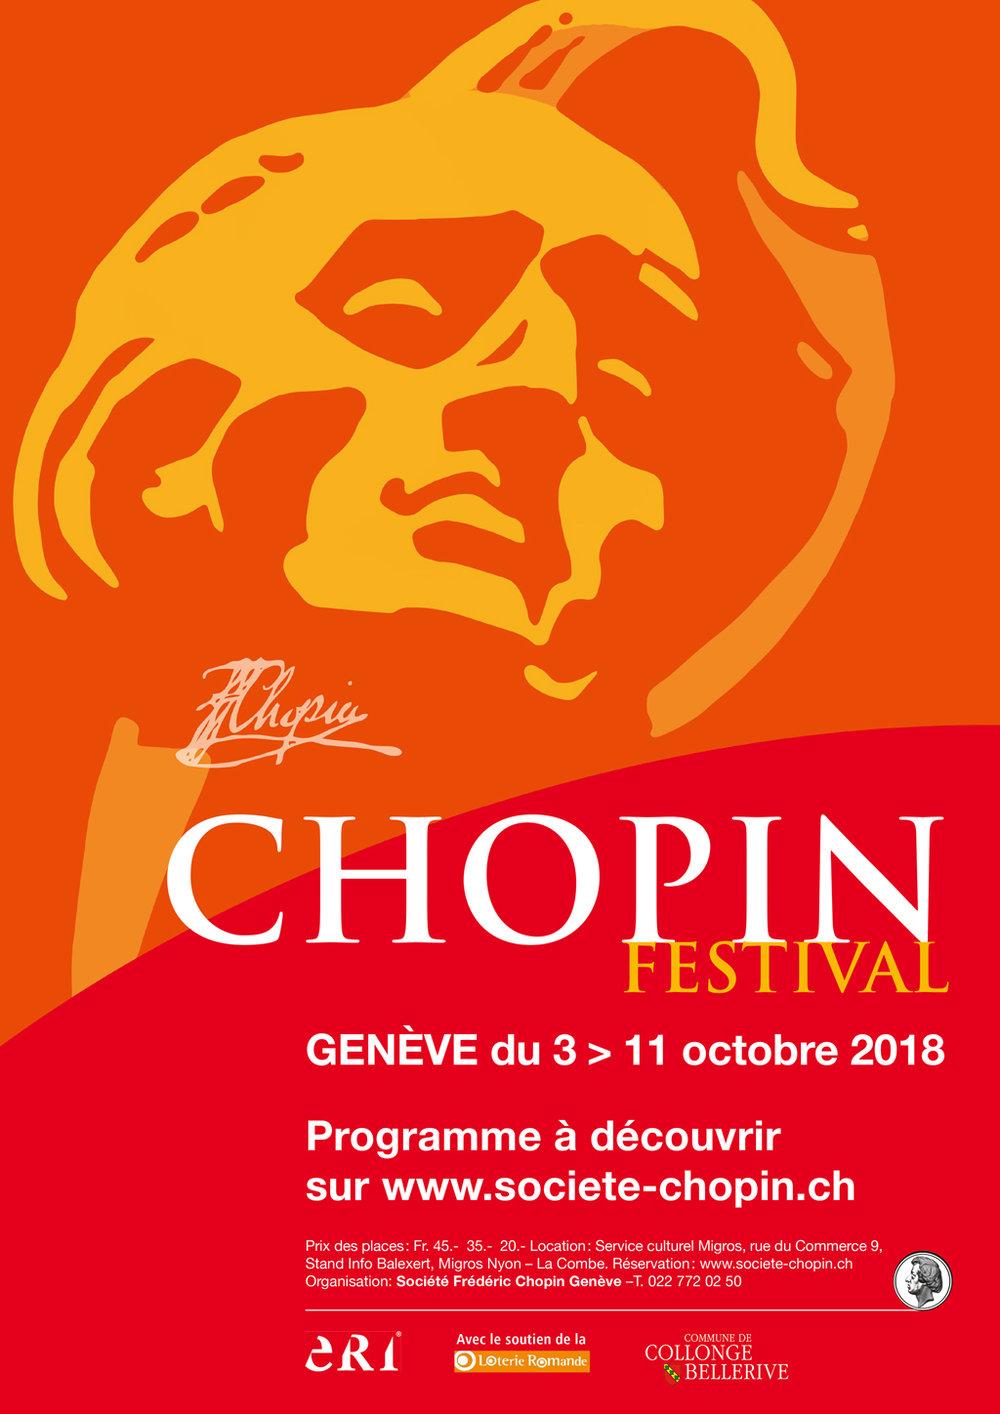 Affiche-Chopin-2018_corr-ok_ims.jpg